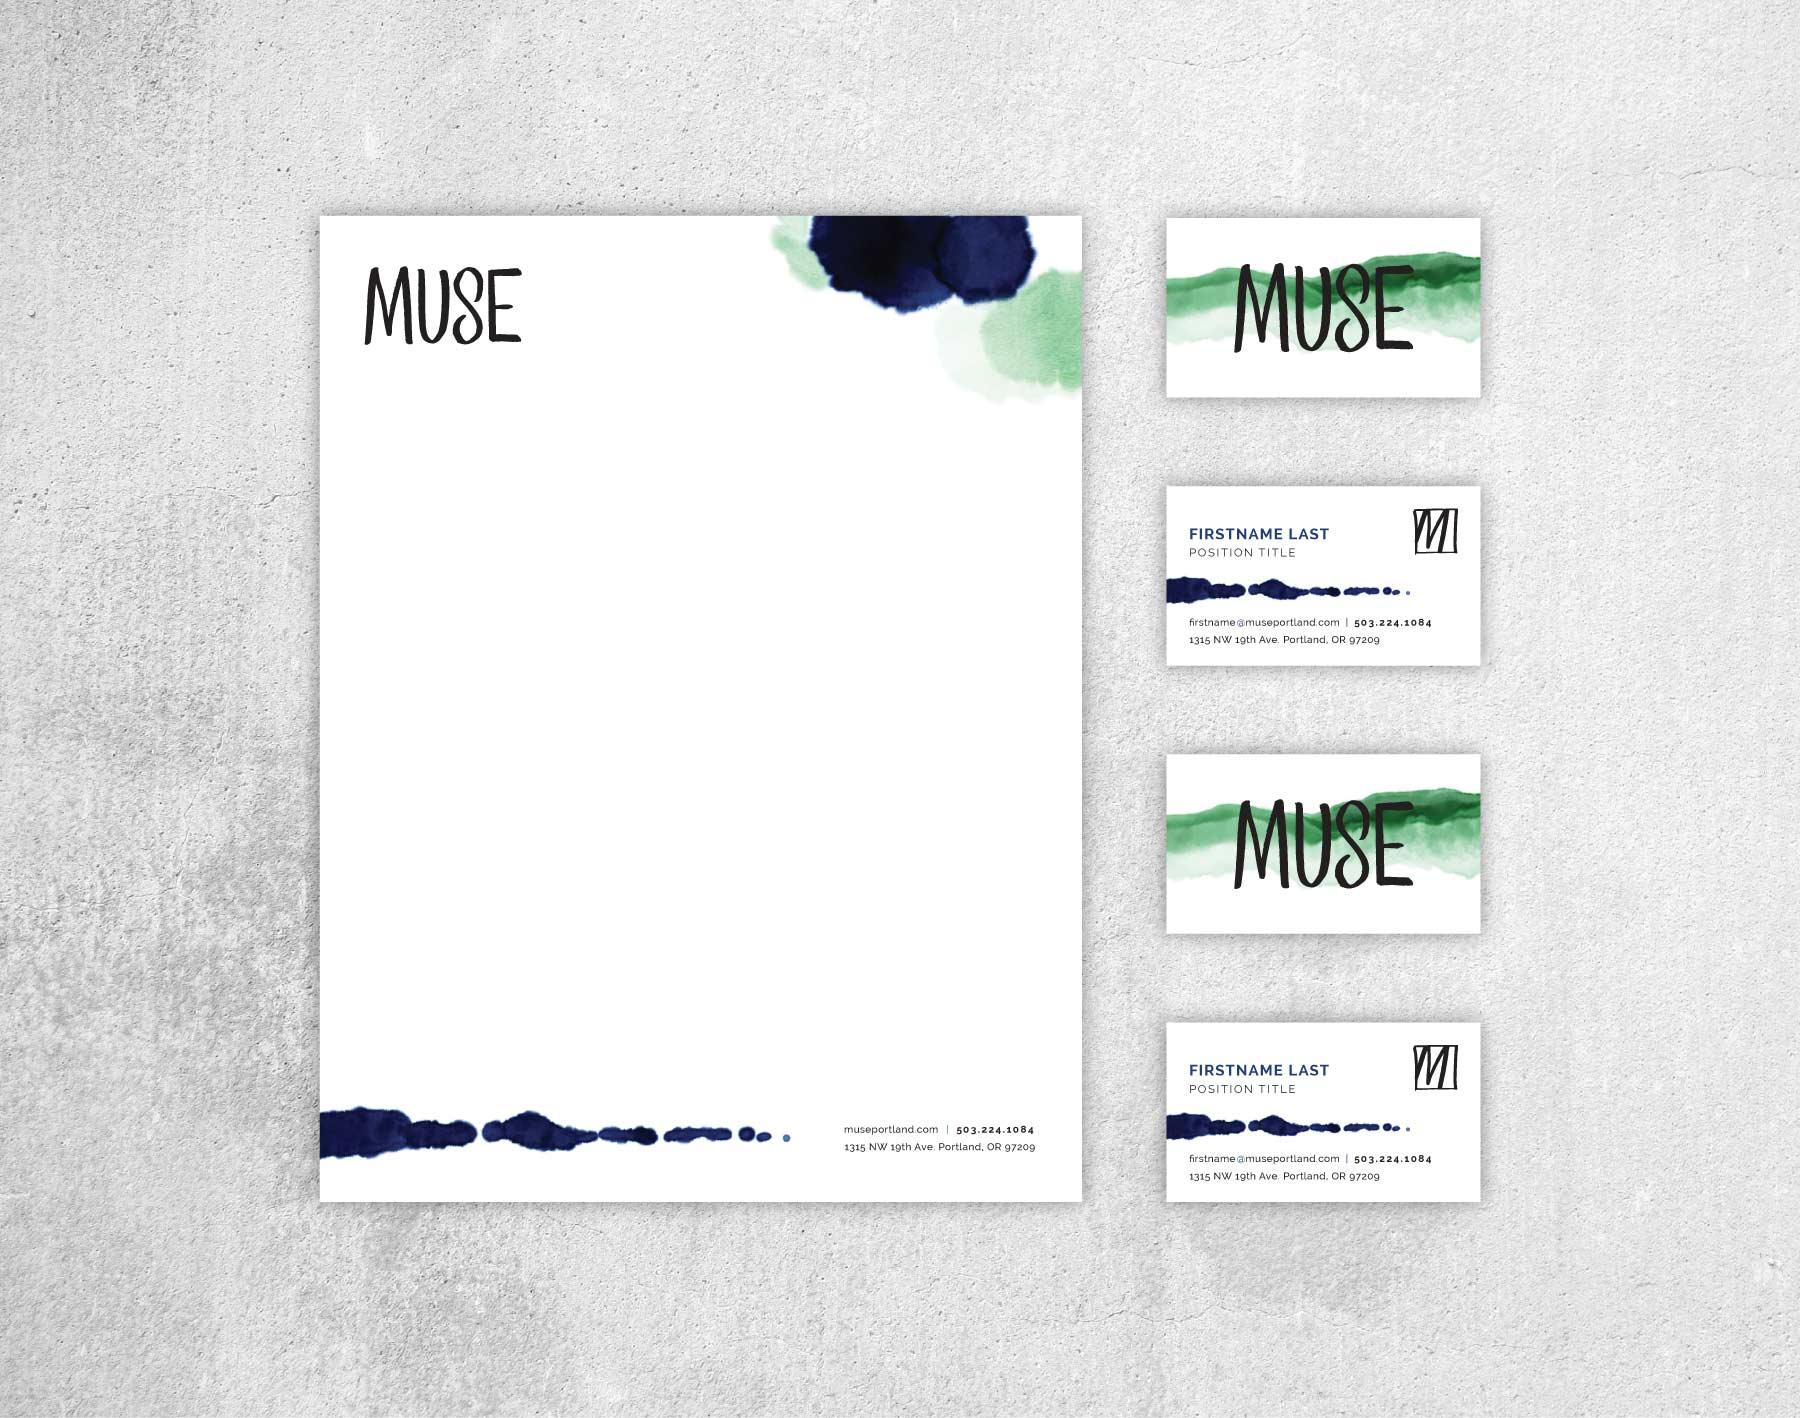 Muse-Stationery.jpg